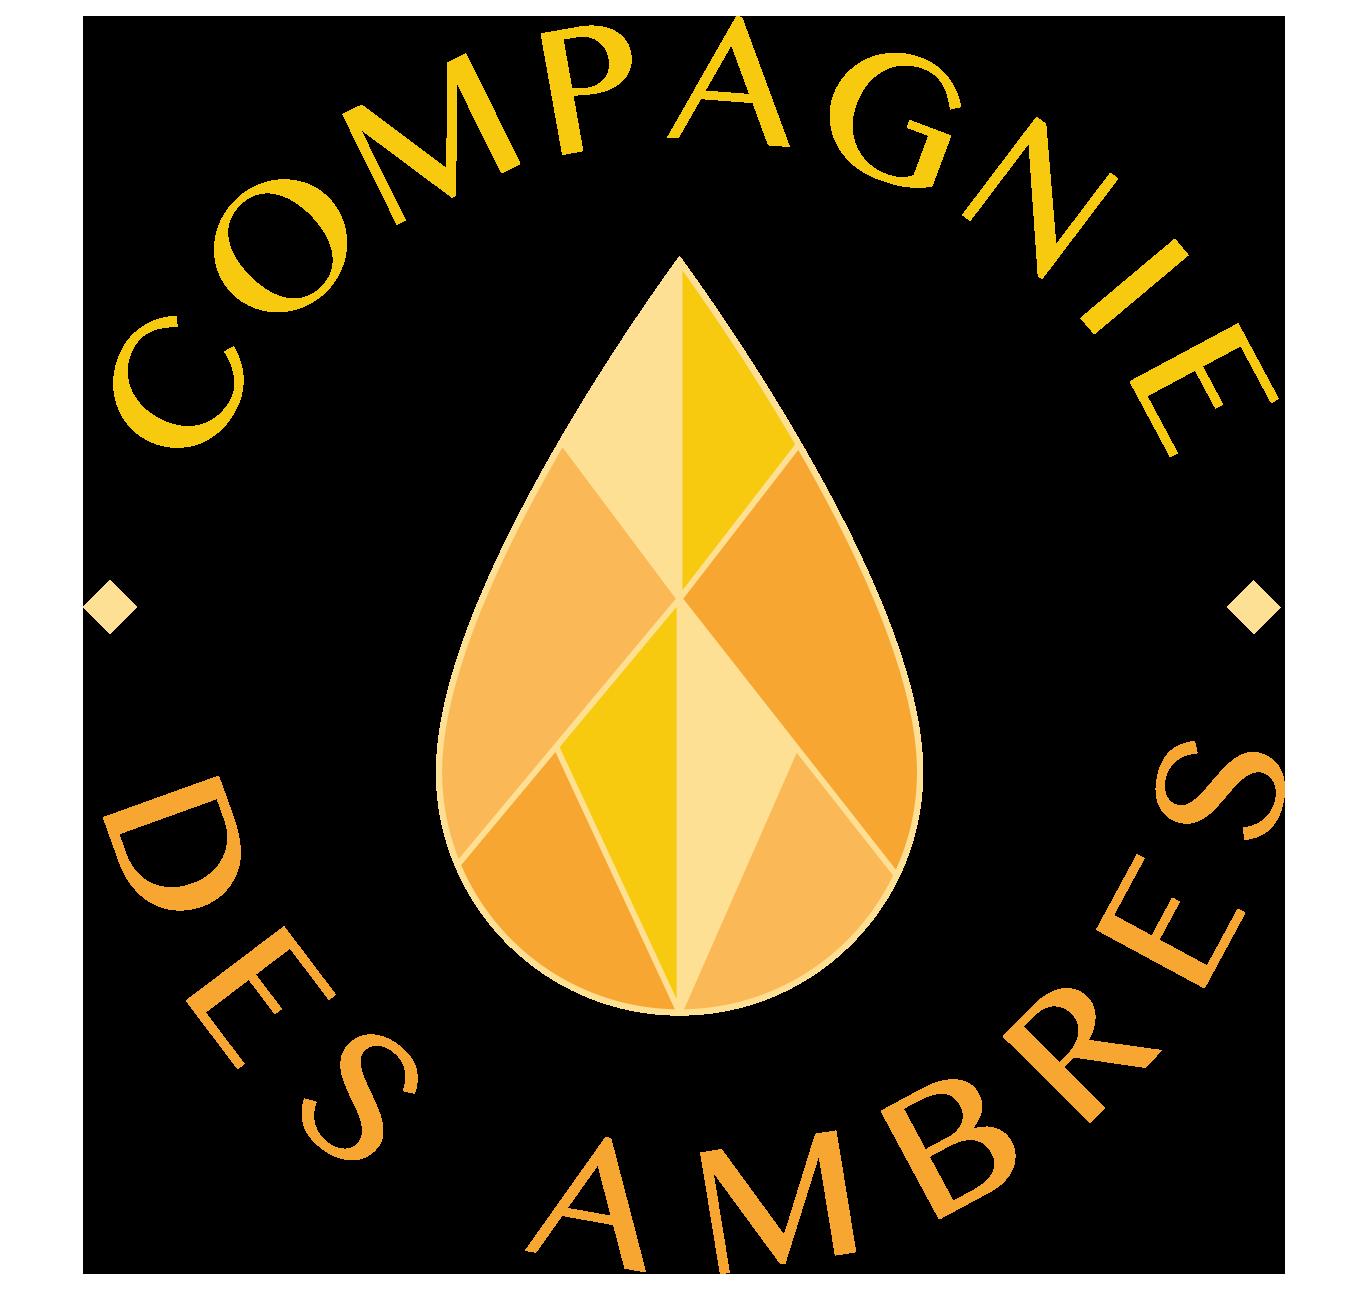 Ciedesambres_logo_OK-2.png